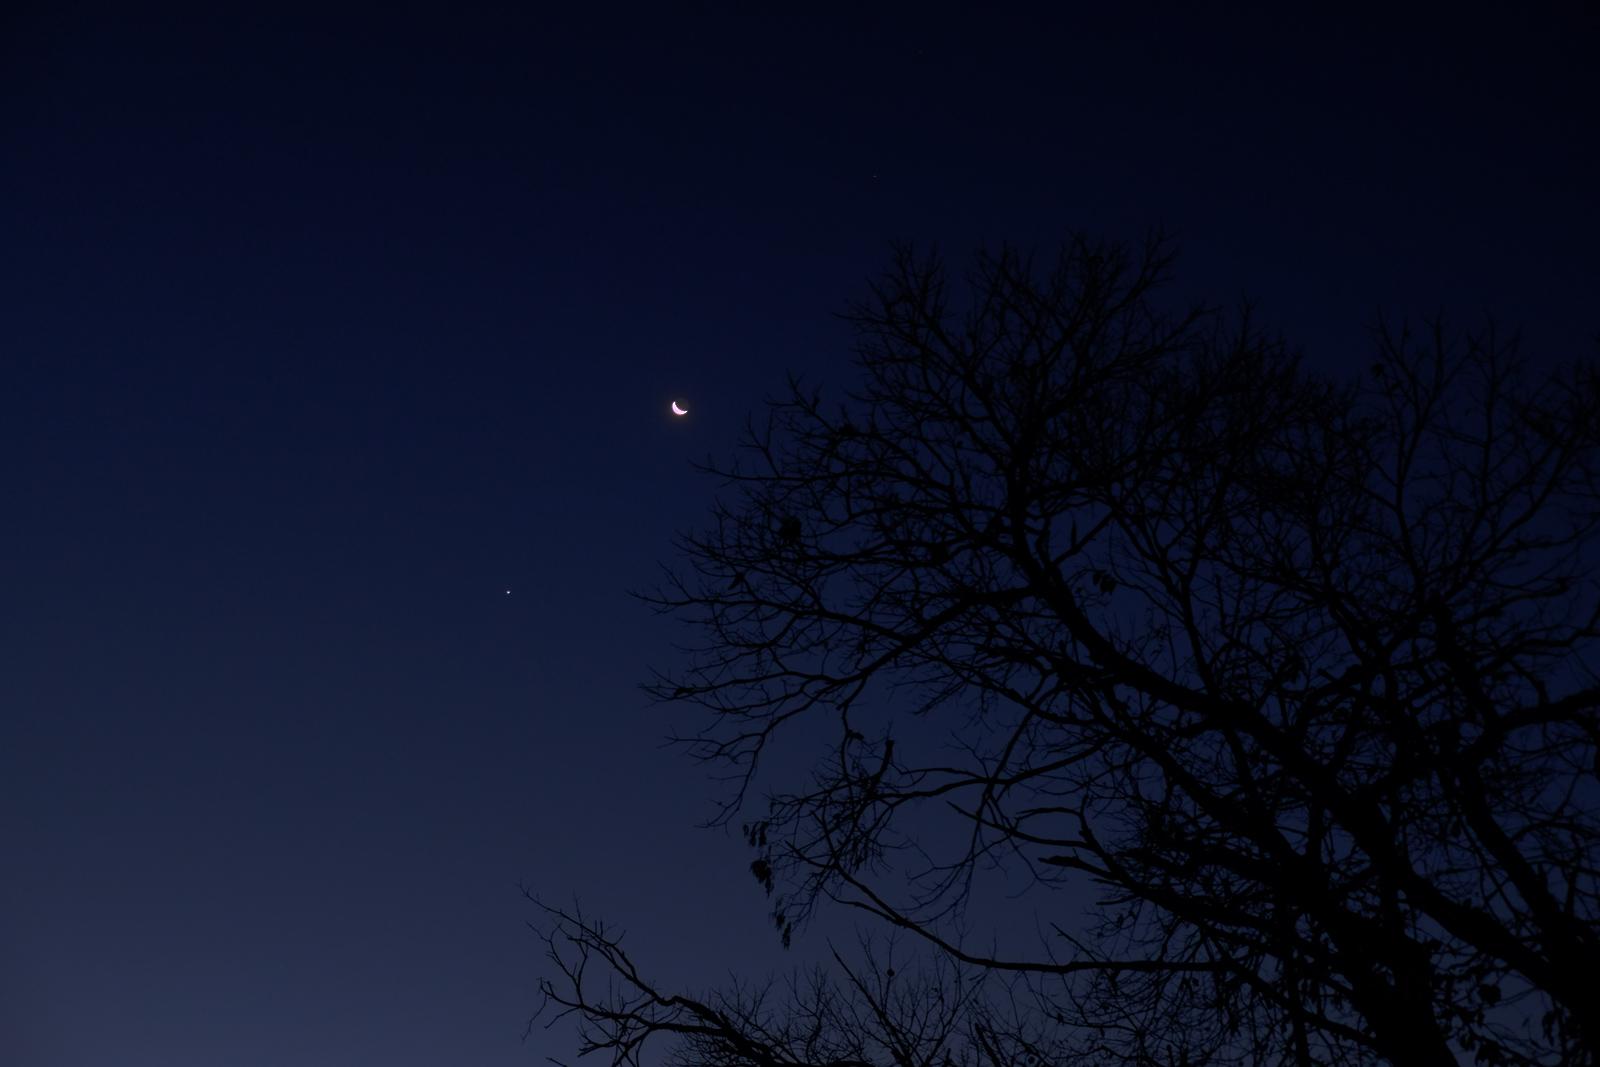 Moon-&-Venus_2015DEC07_1600px.jpg